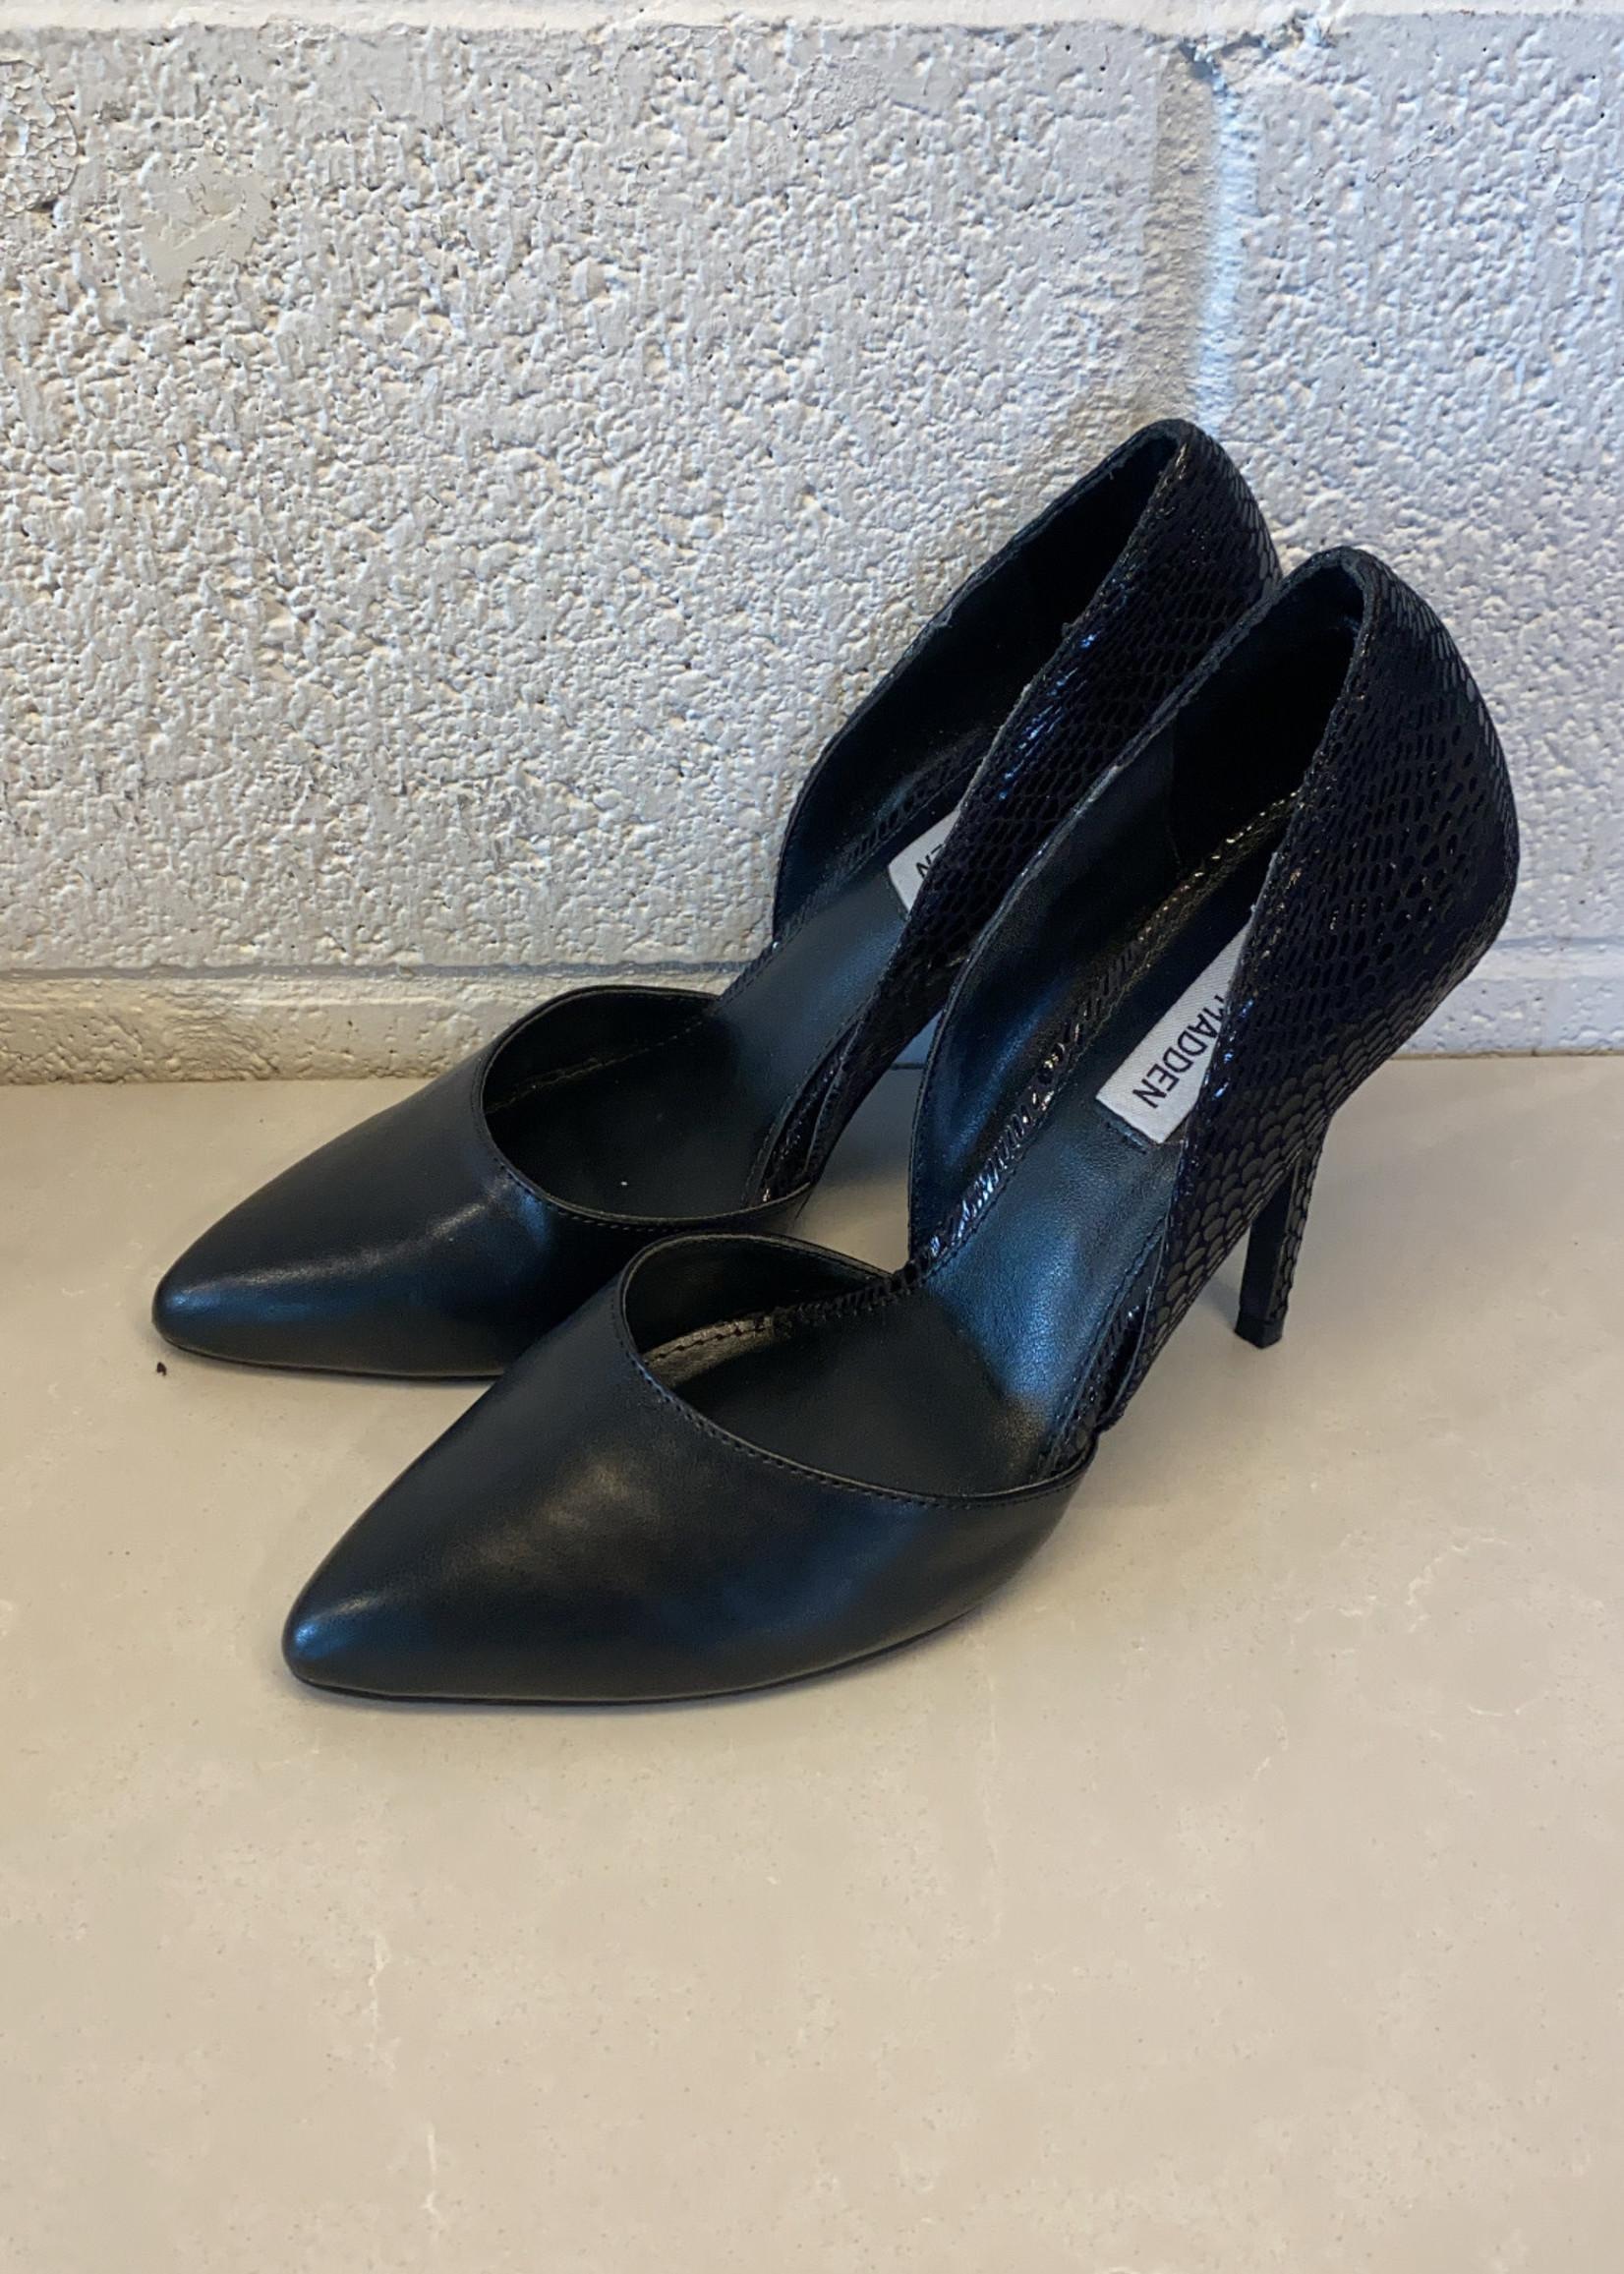 Steve Madden Black Pointed Toe Heels 7.5